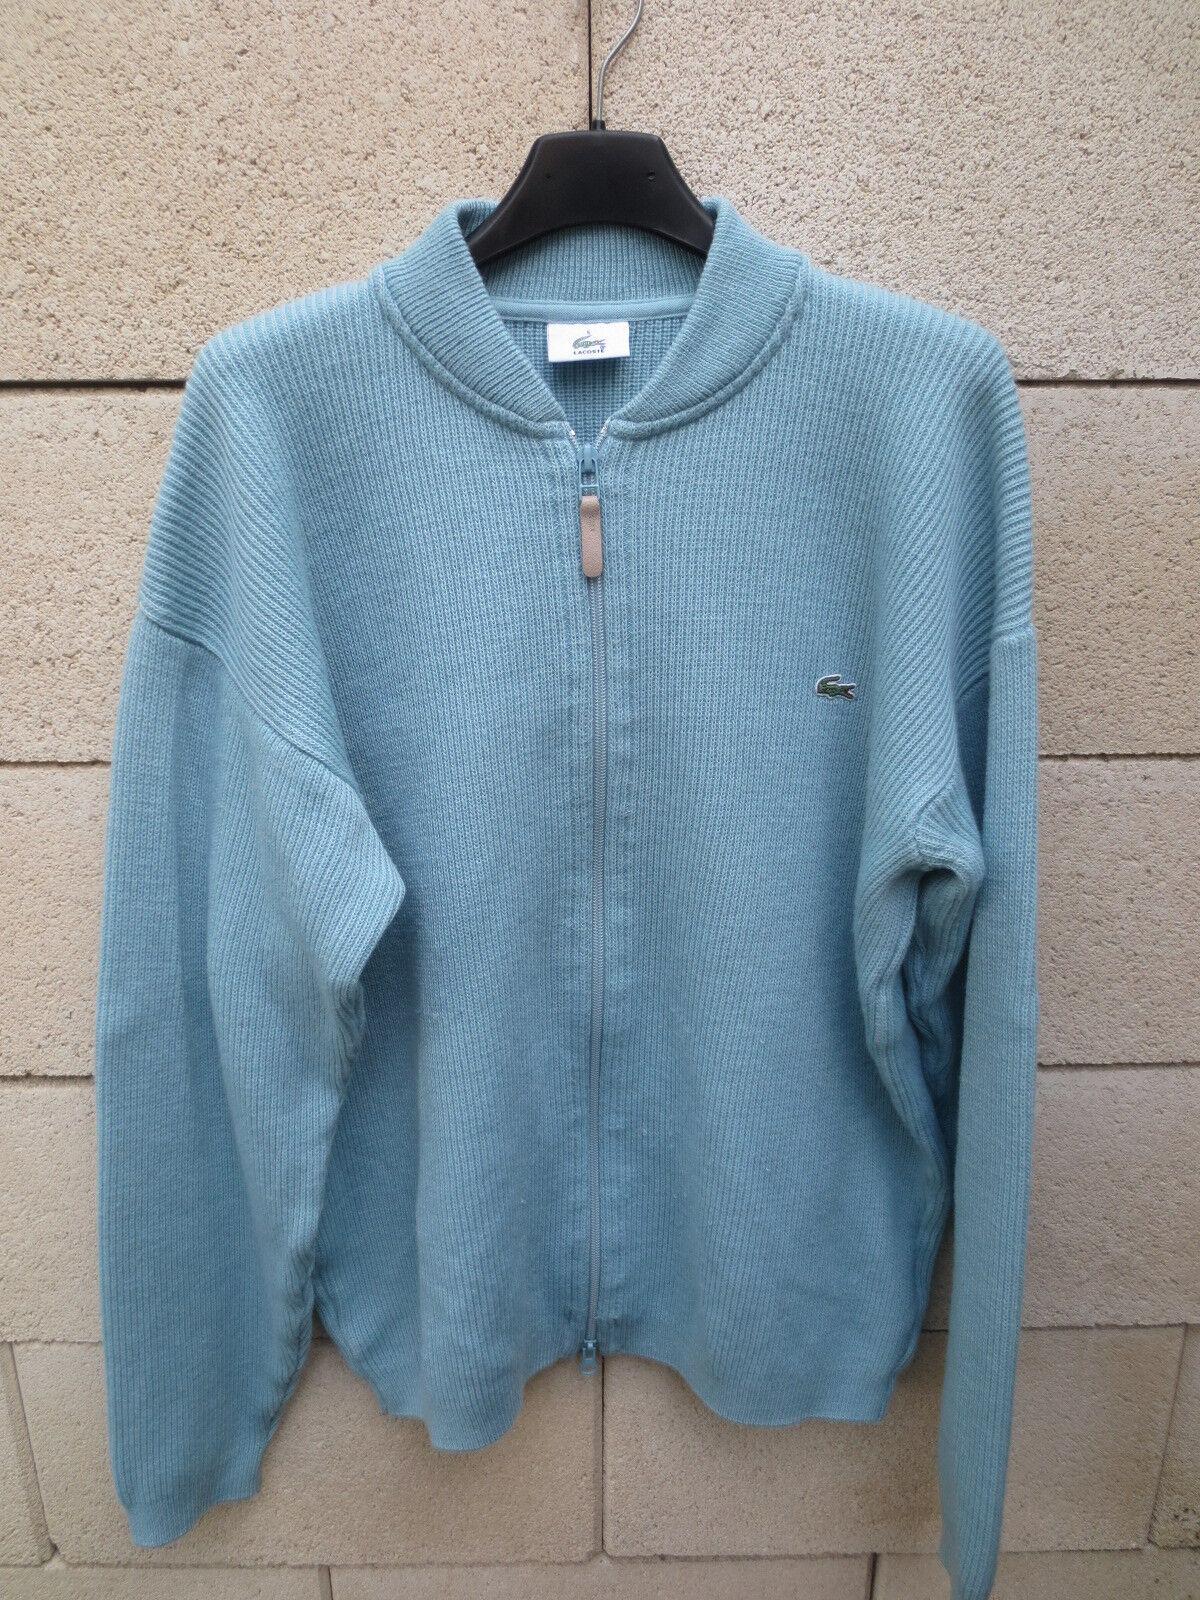 Woolmark Gilet Ciel 5 Bleu Devanlay Laine Wool Lacoste rqwxTar